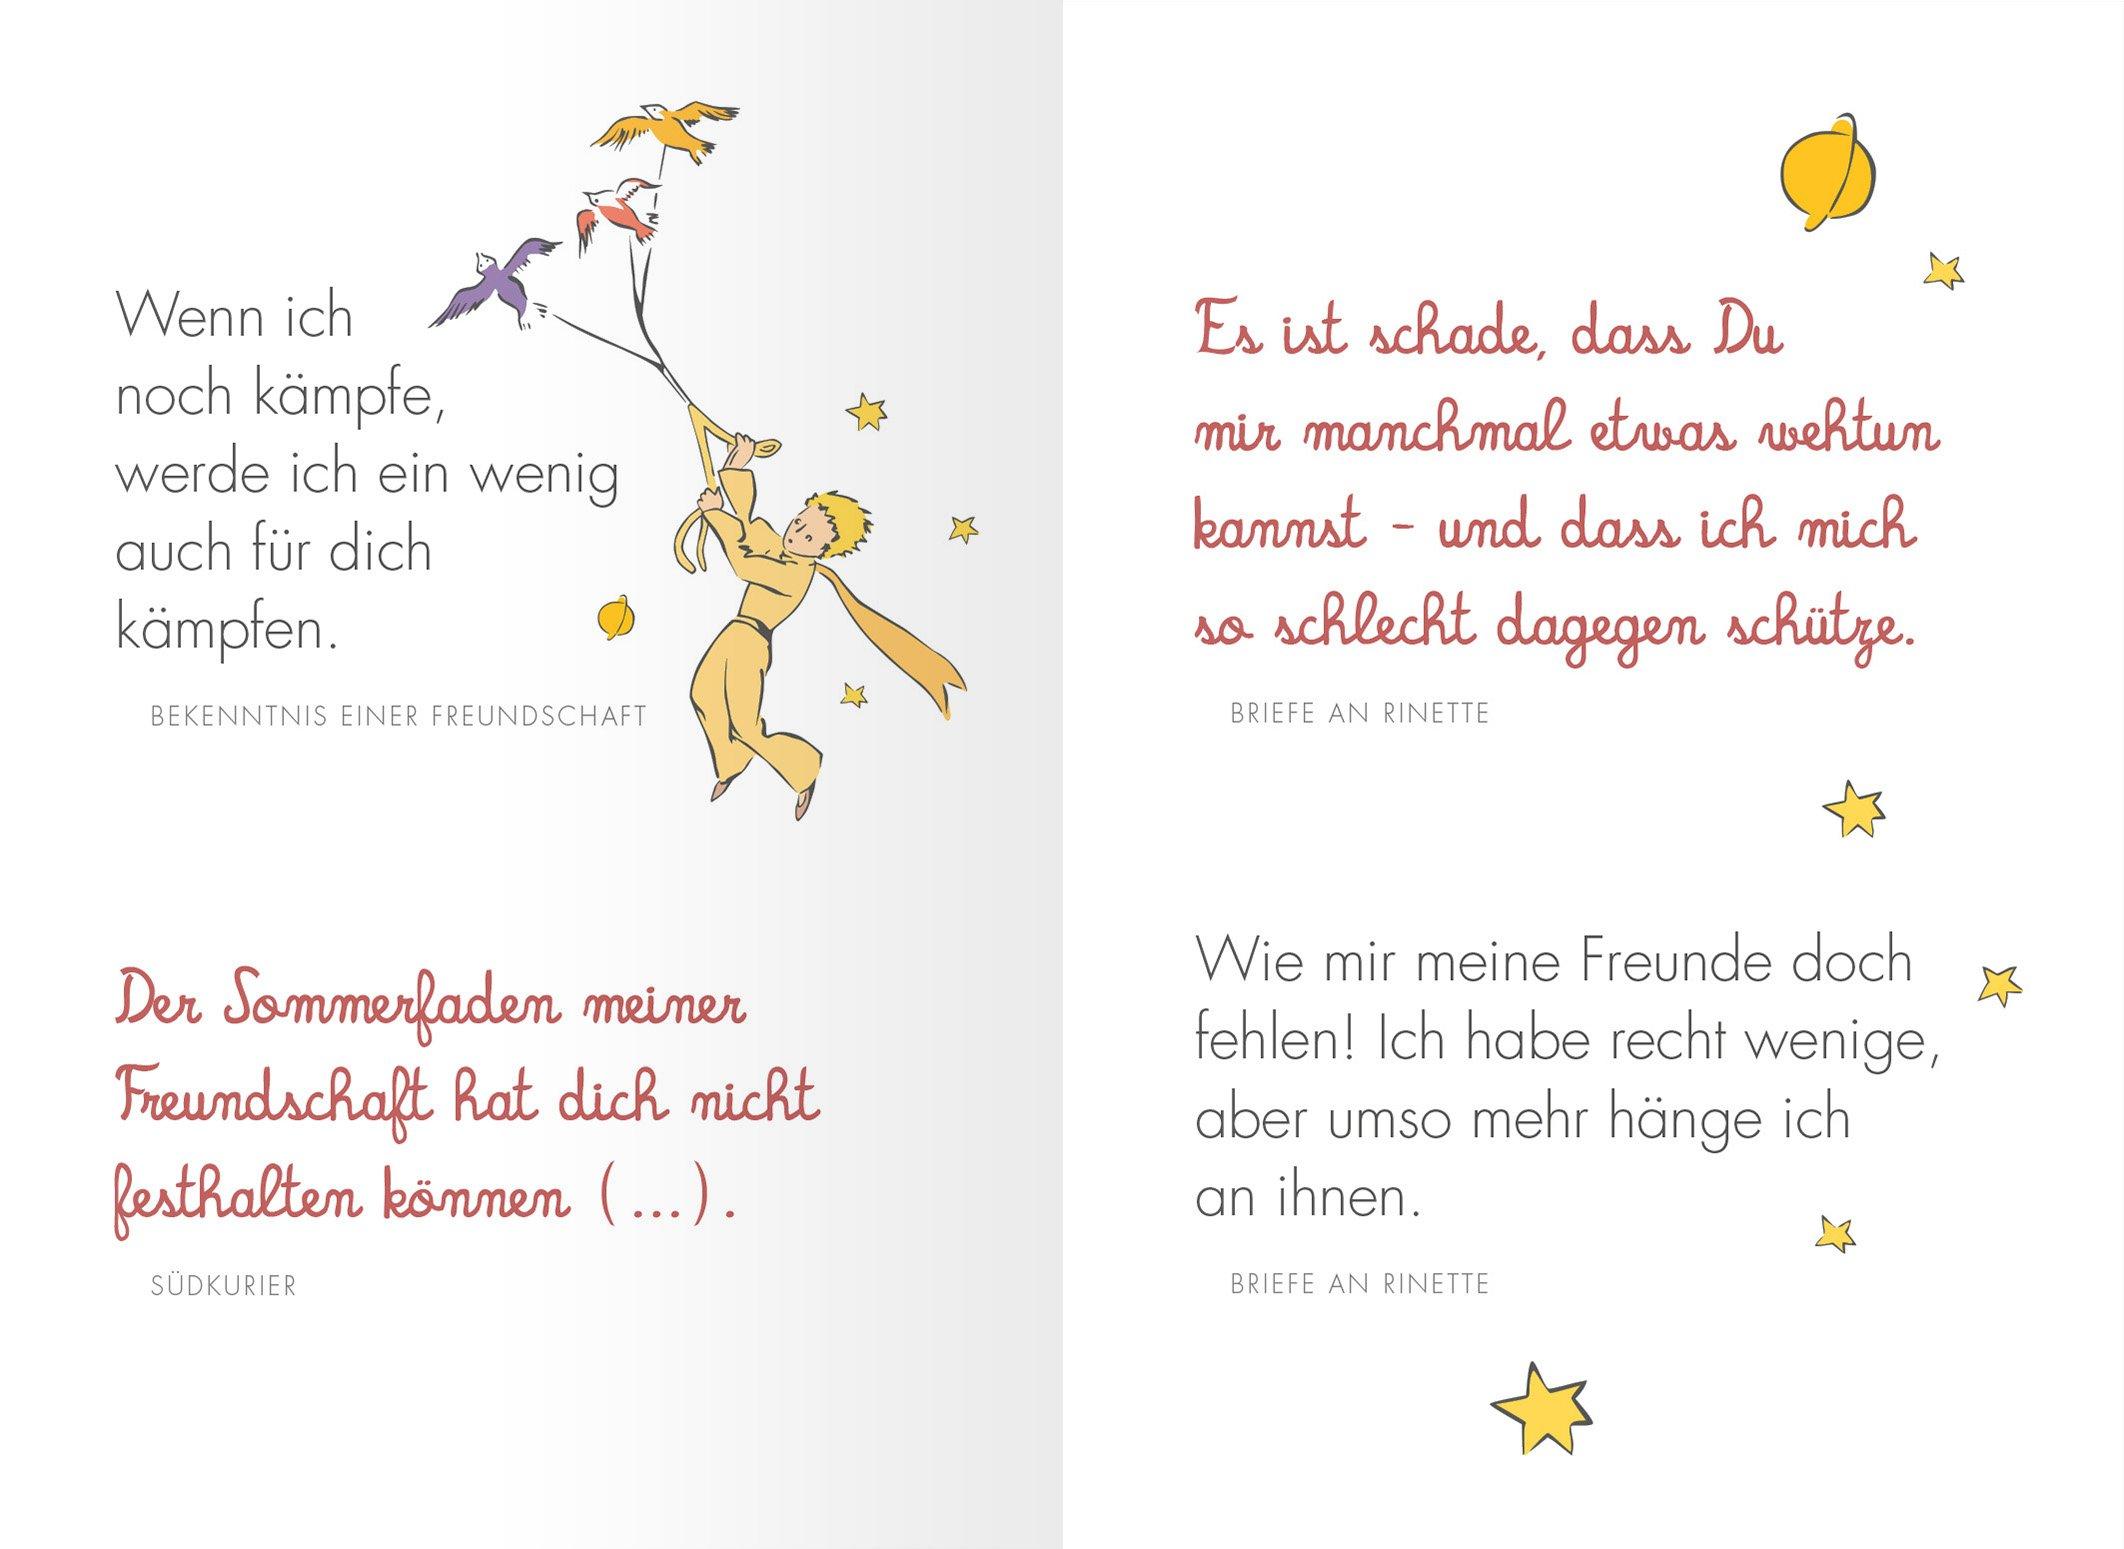 Freundschaft Schonsten Zitate Von Antoine De Saint Exupery Amazon De Antoine De Saint Exupery Ba C Bccher